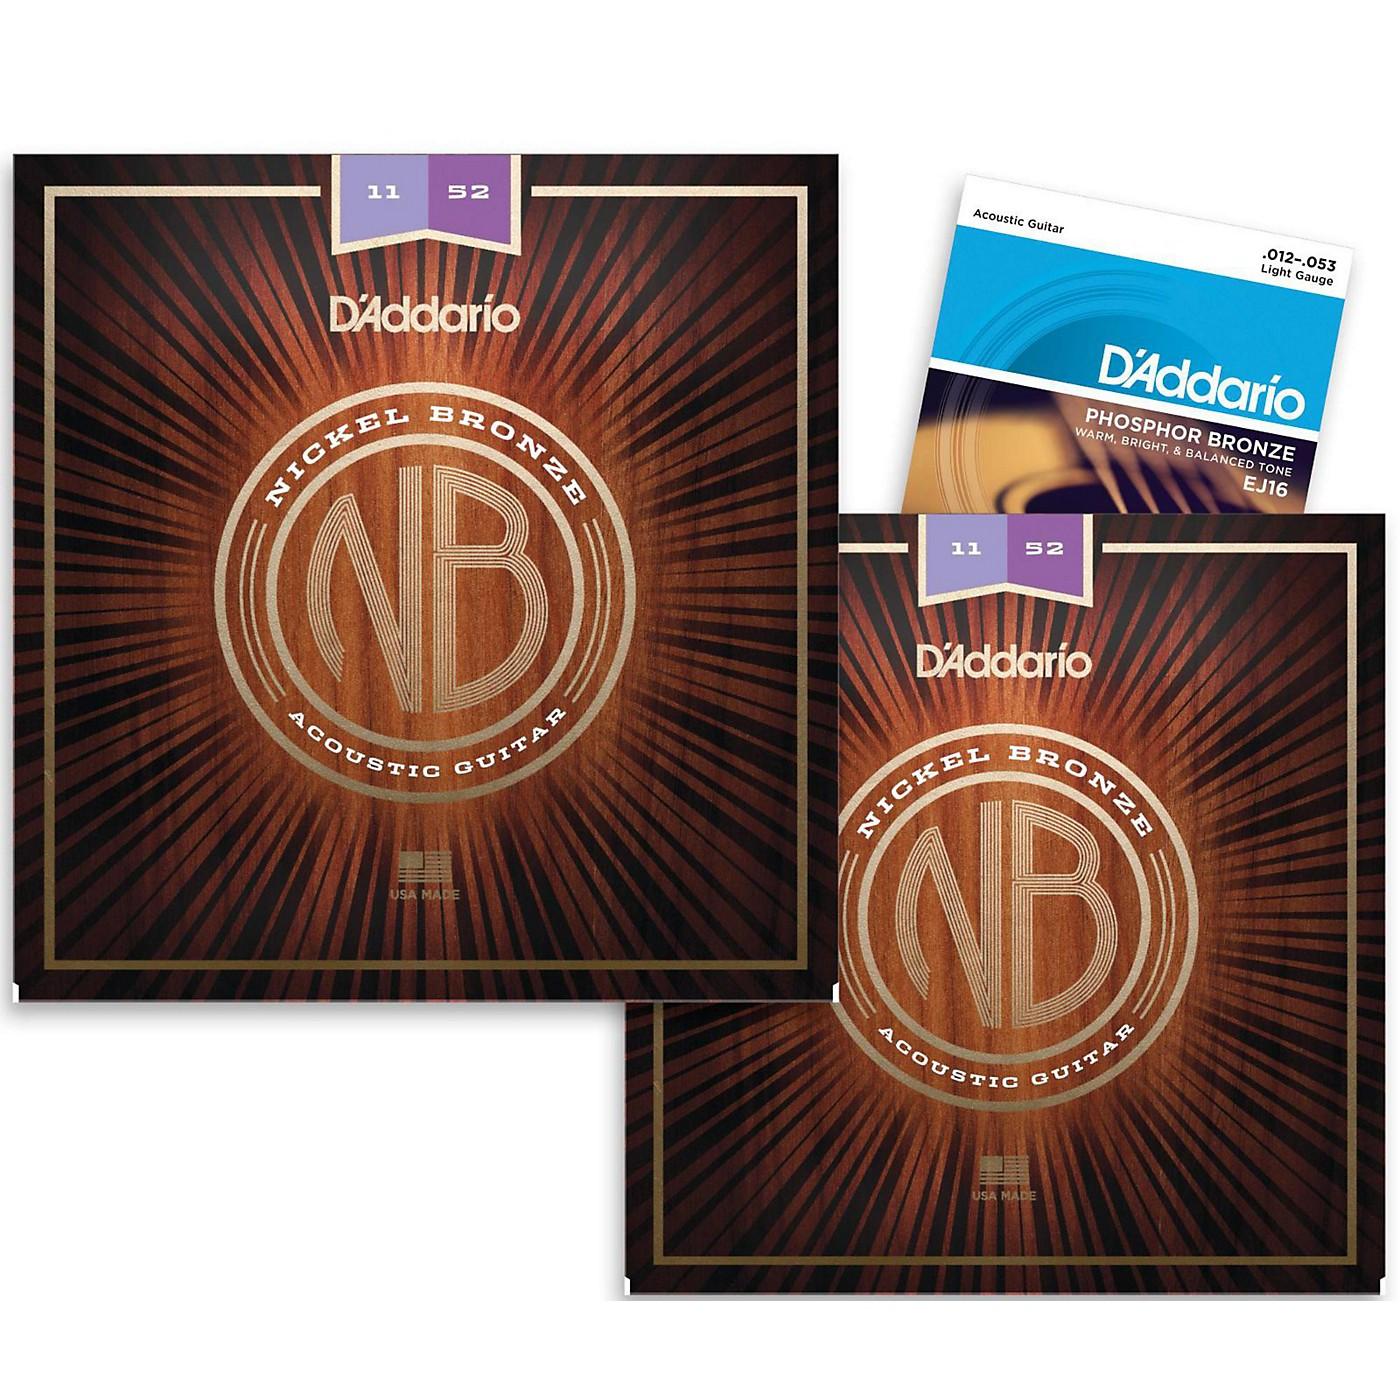 D'Addario NB1152 Nickel Bronze Custom Light Acoustic Strings 2-Pack with EJ16 Phosphor Bronze Light Single-Pack thumbnail